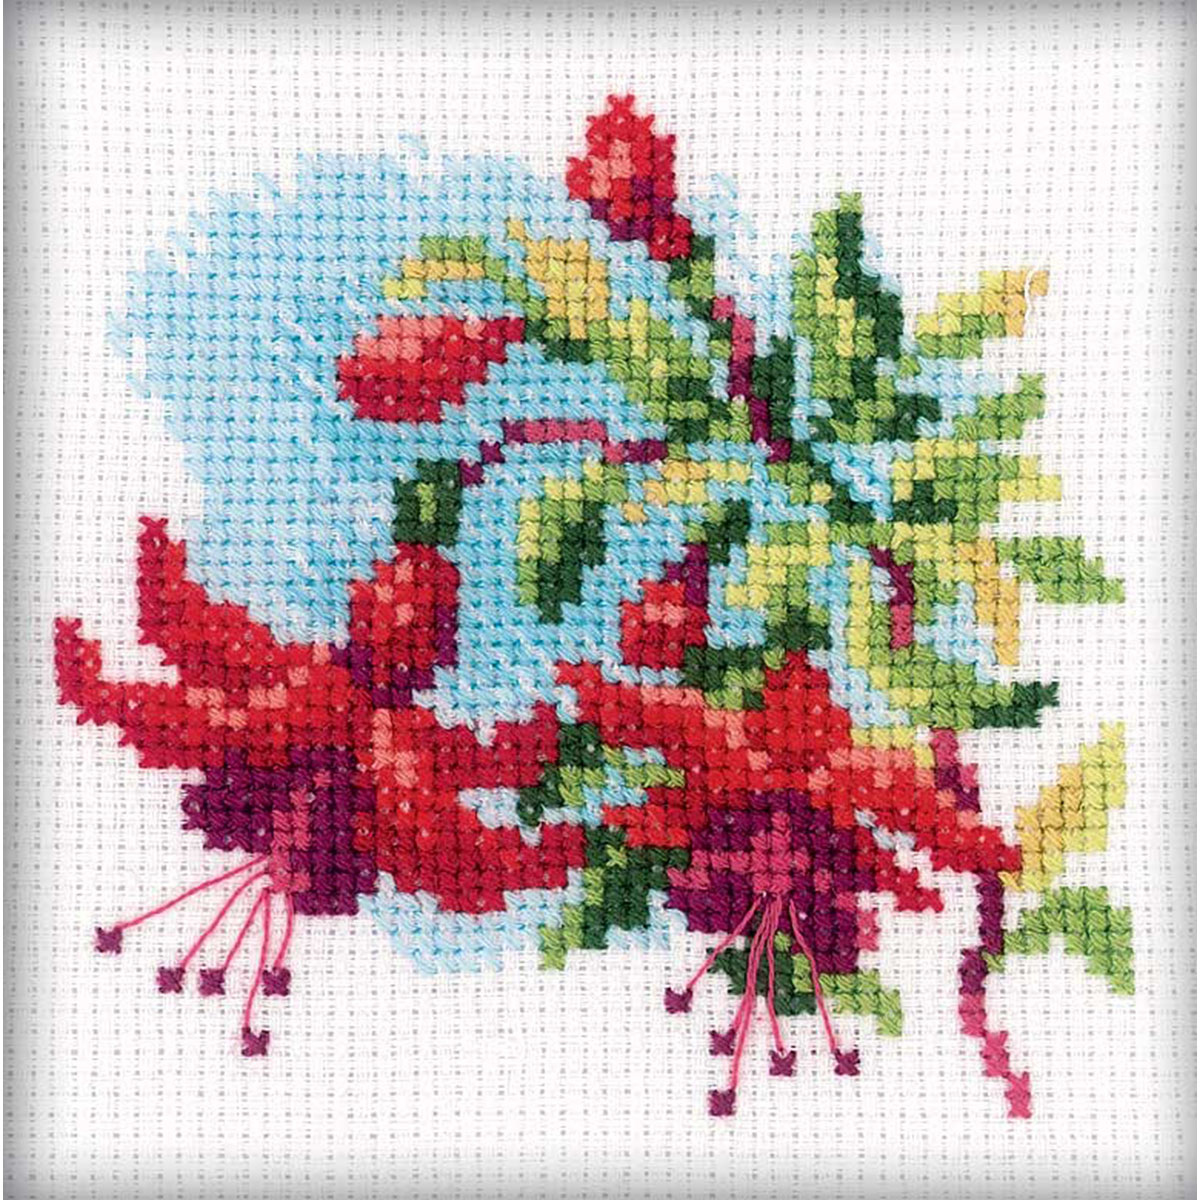 "Fuchsia Counted Cross Stitch Kit, 4"" x 4"", 14-Count"